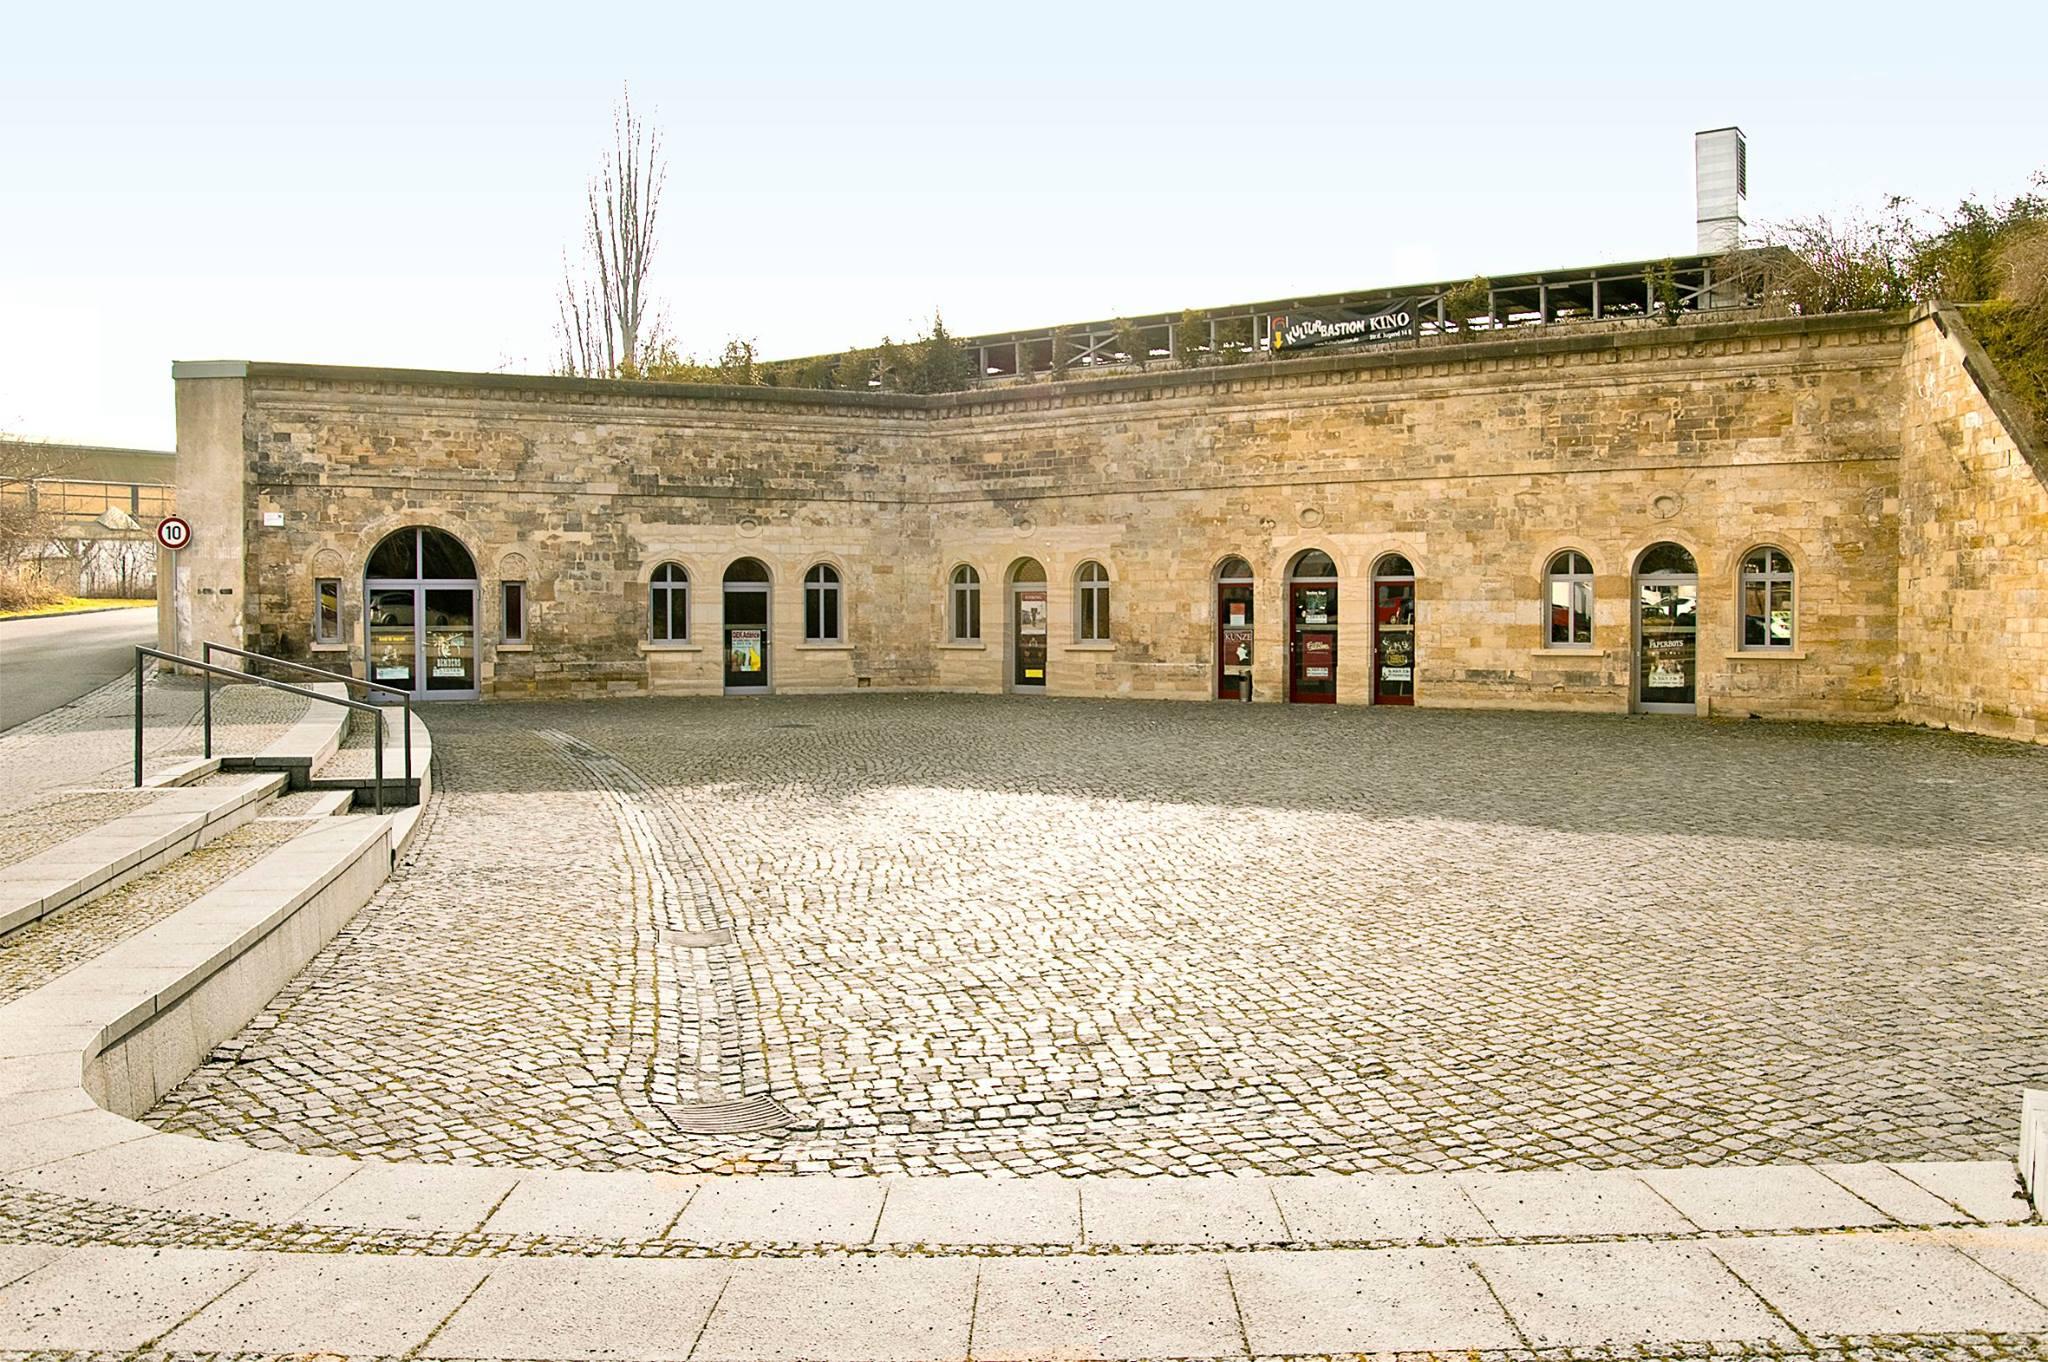 Kap Kino Torgau Programm